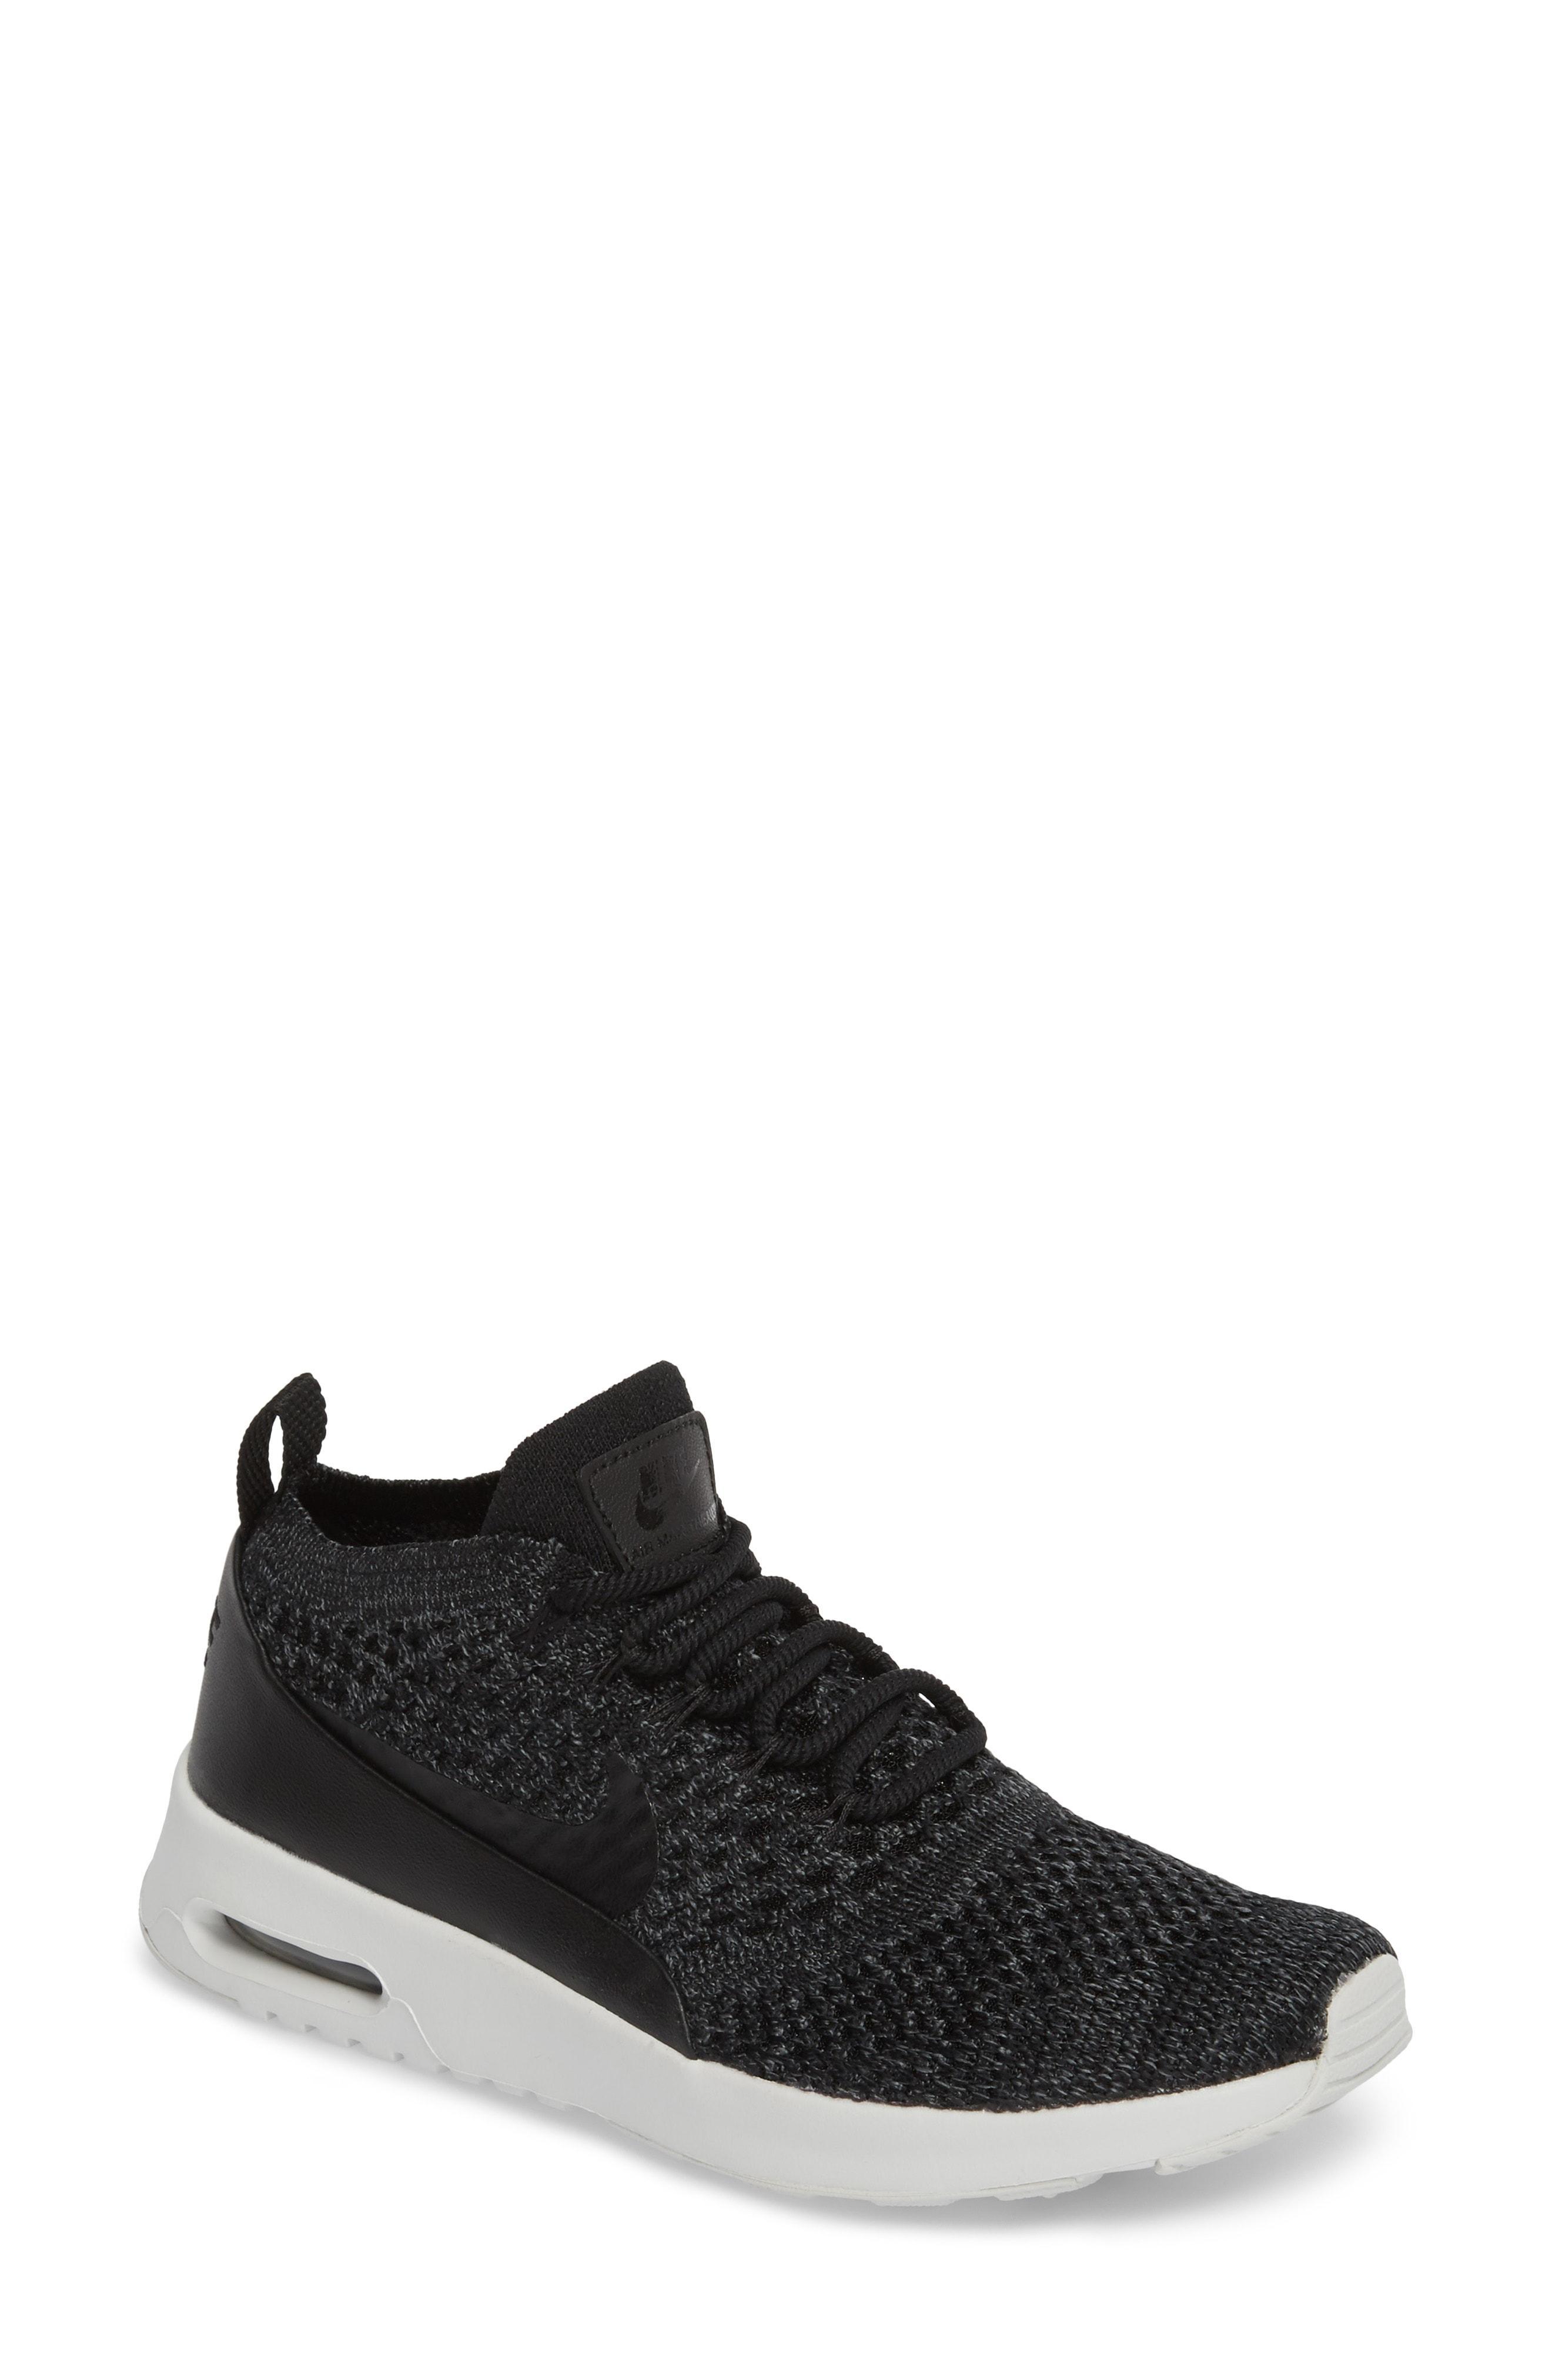 sale retailer eae0e 6b5ad Nike Women s Air Max Thea Ultra Flyknit Lace Up Sneakers In Geranium   Geranium